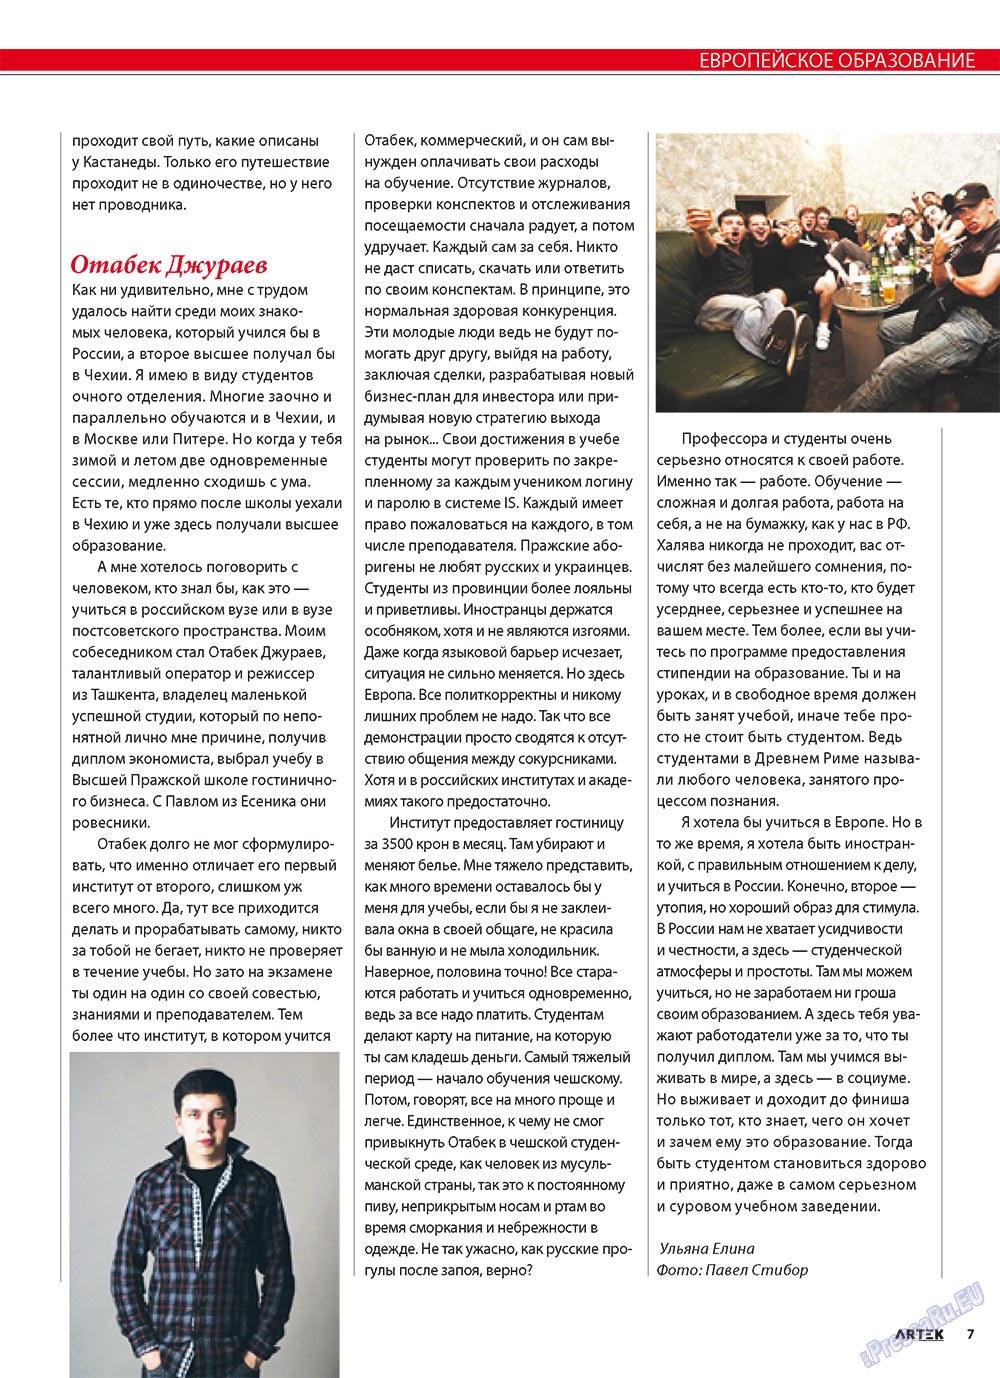 Артек (журнал). 2010 год, номер 5, стр. 9